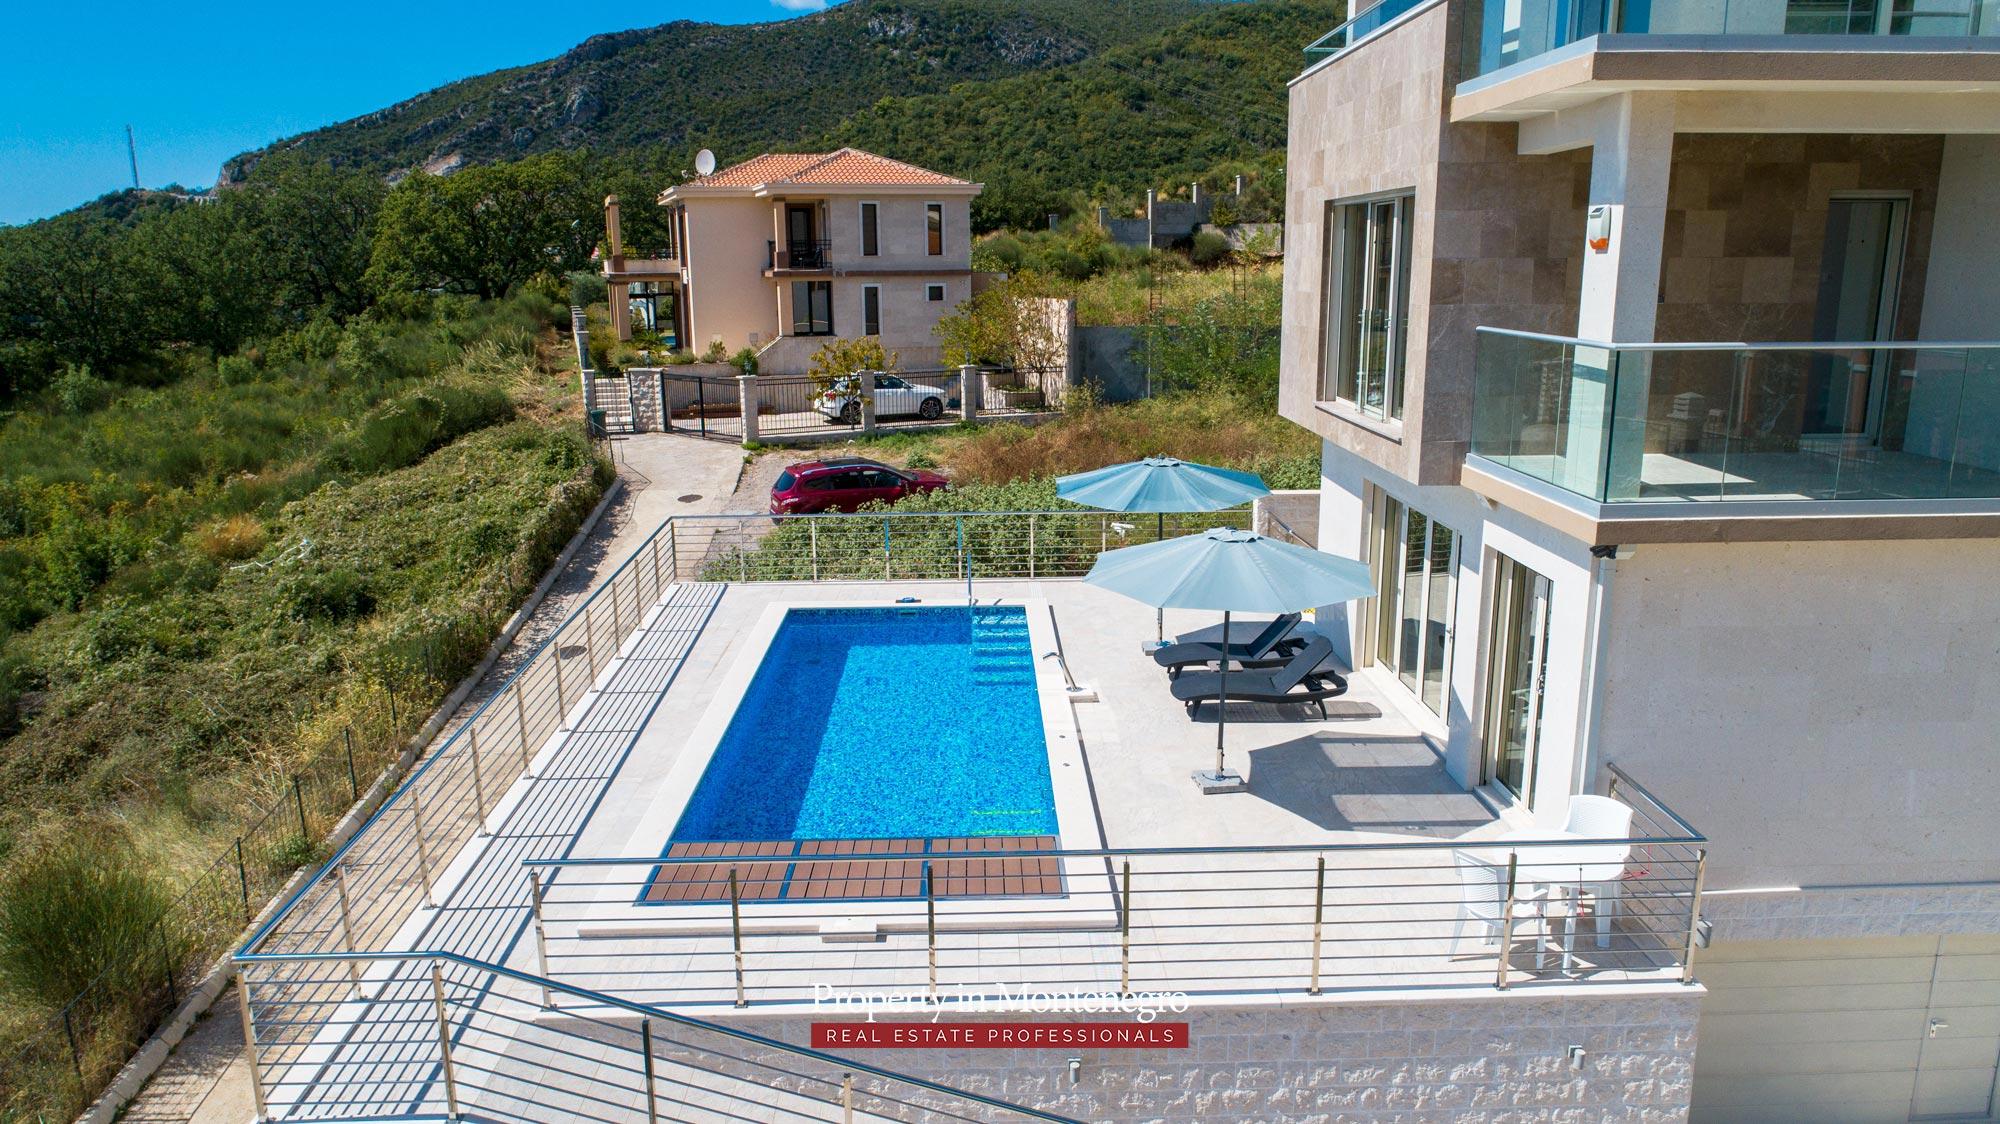 luxury-villa-with-swimming-pool-for-sale-in-Budva (44).jpg